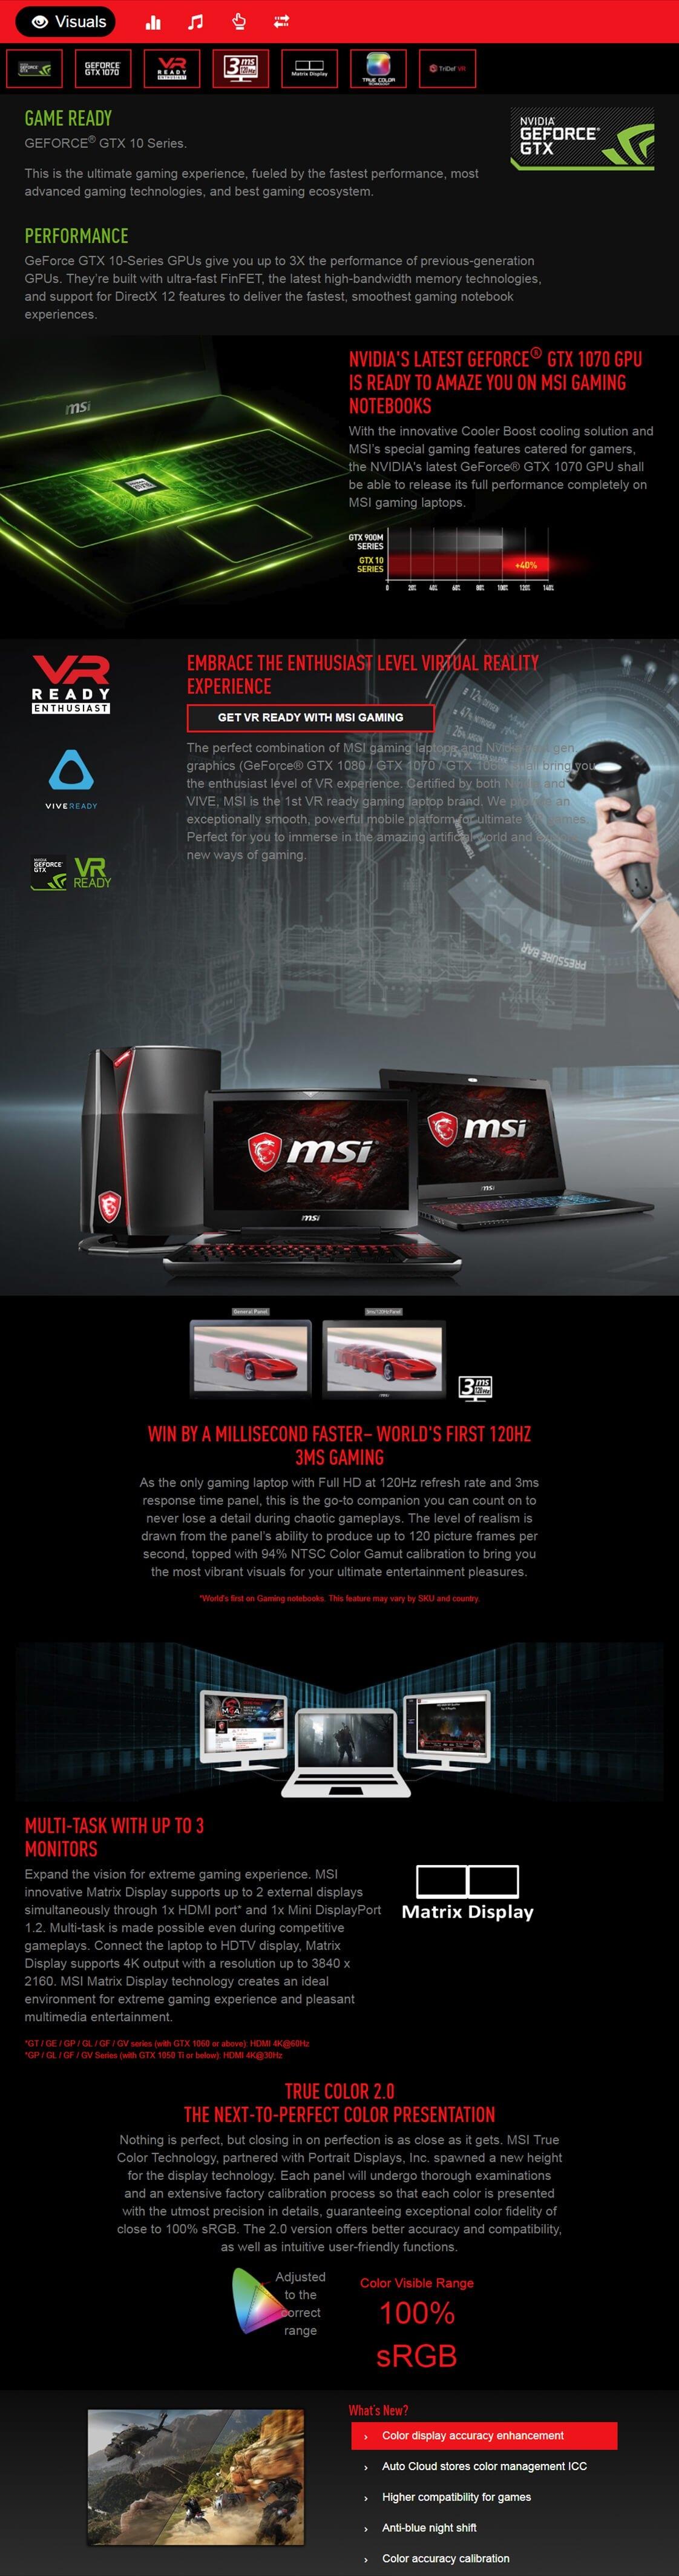 Msi Ge63 8rf 089au 156 Fhd Intel Core I7 Gaming Laptop Rgb 8750h 16gb 256gb 1tb Gtx1070 W10 Quick Specifications